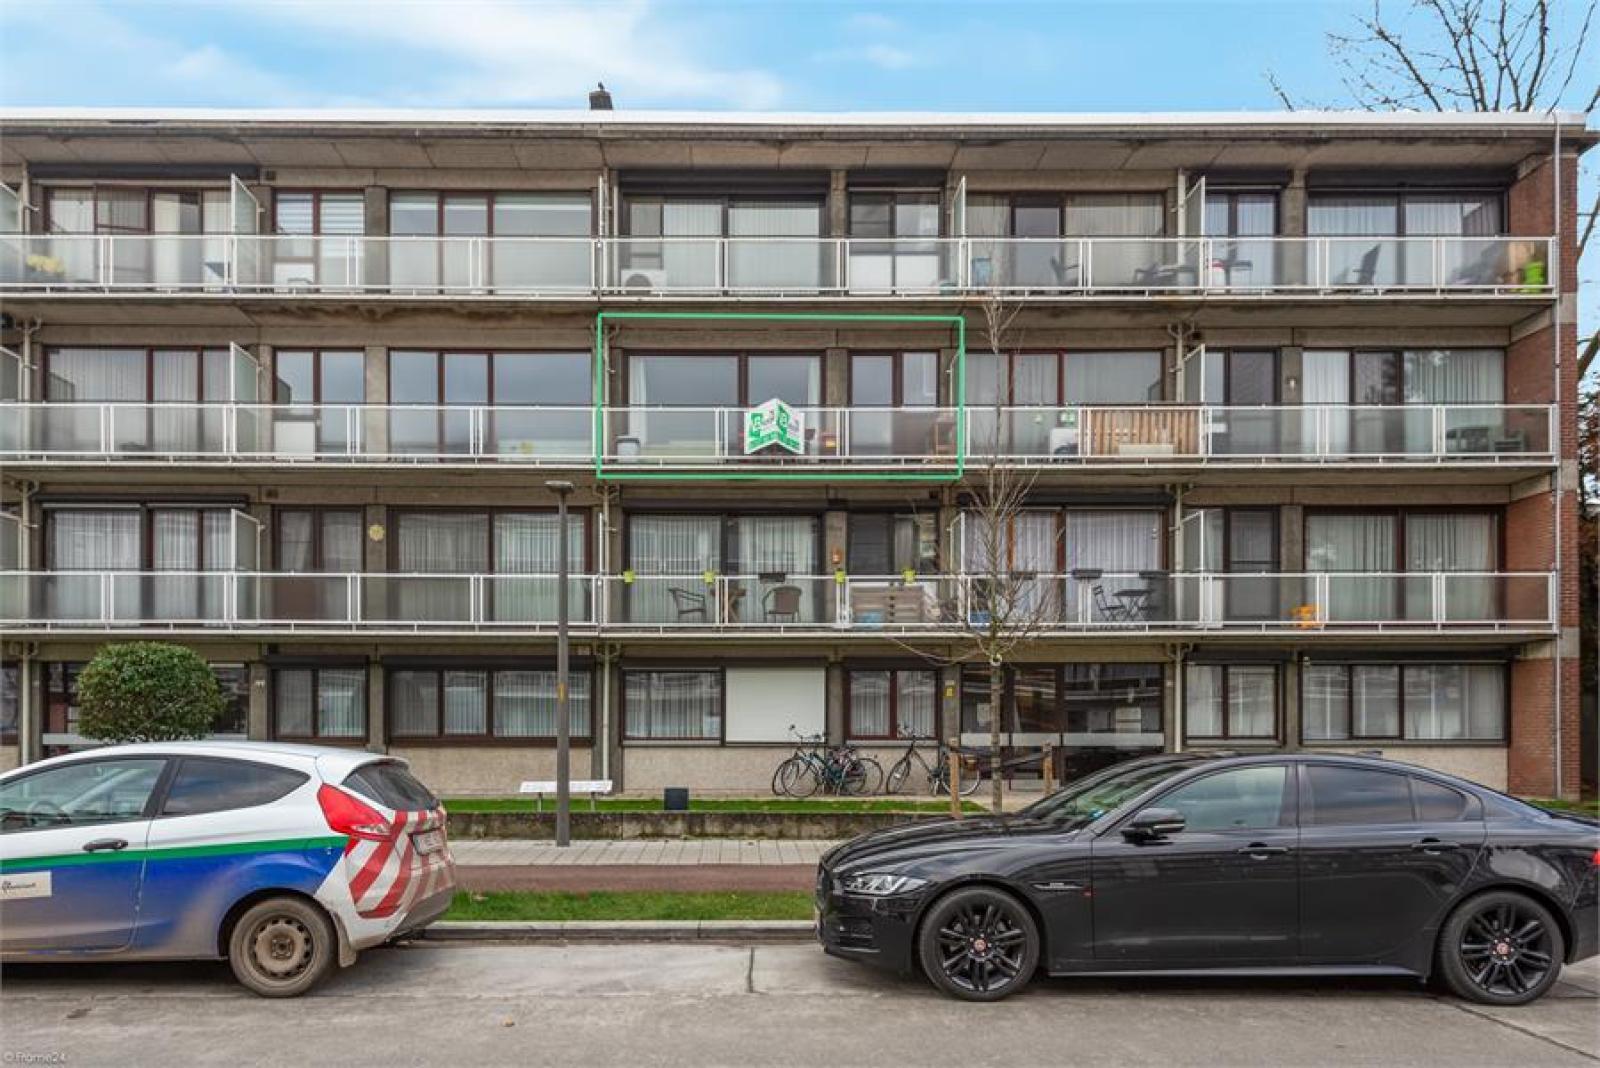 Instapklaar appartement (77 m²) met twee slaapkamers op centrale ligging te Deurne! afbeelding 16